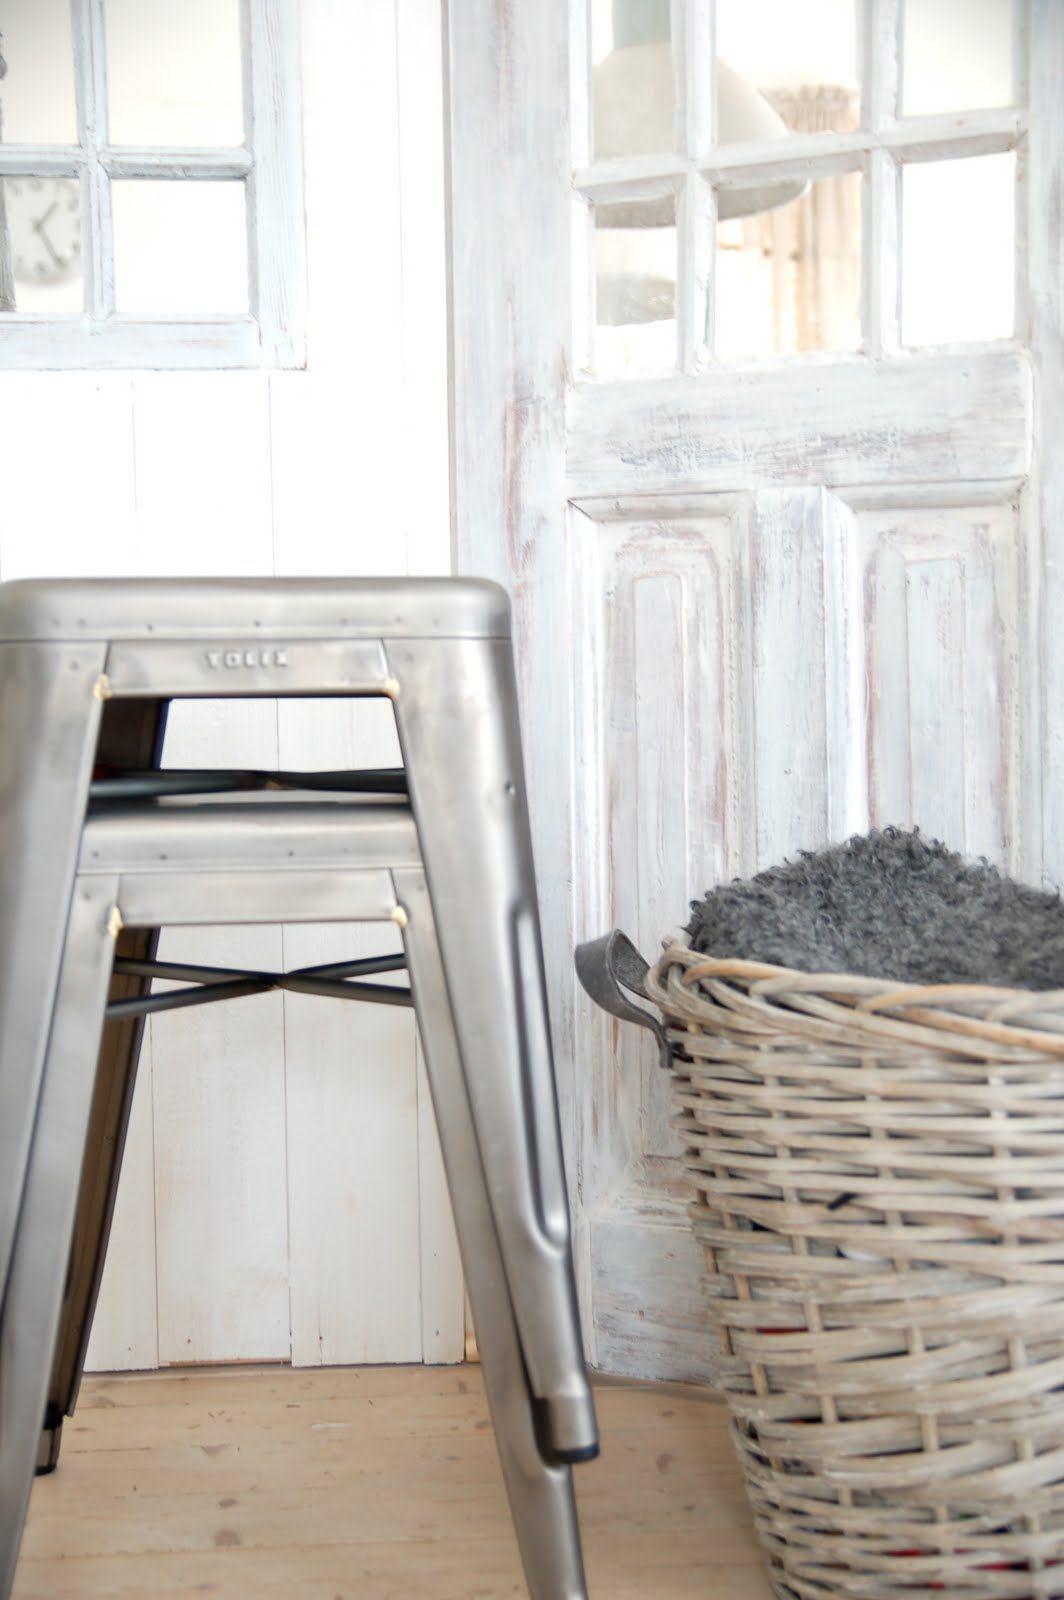 dsc 0076 jpg 1 064 1 600 pixels home pinterest stools neutral rh pinterest co uk